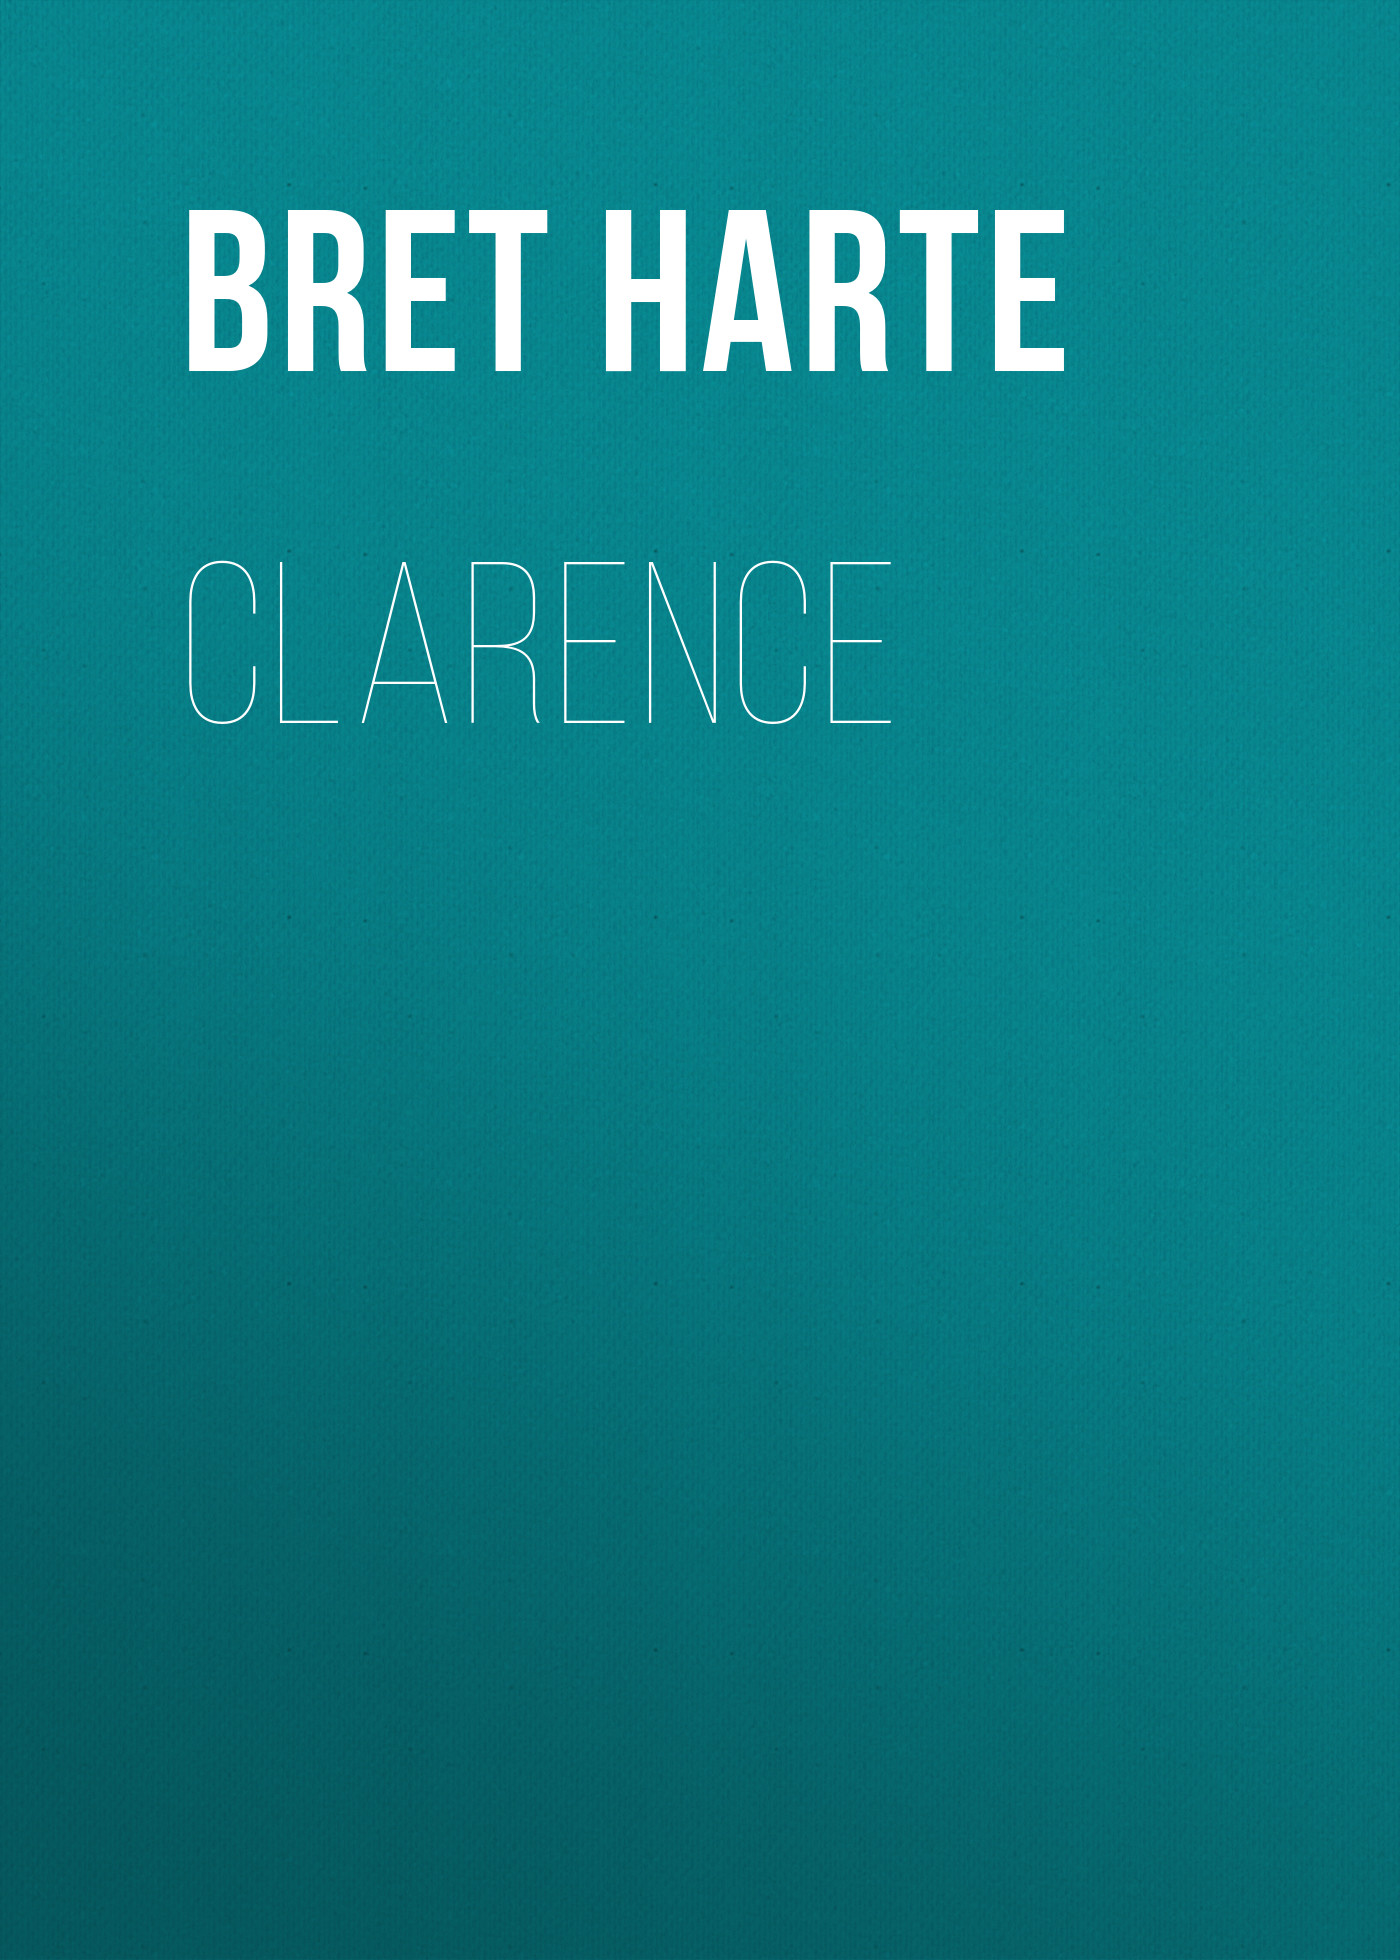 Bret Harte Clarence bret harte novels and stories of bret harte volume 8